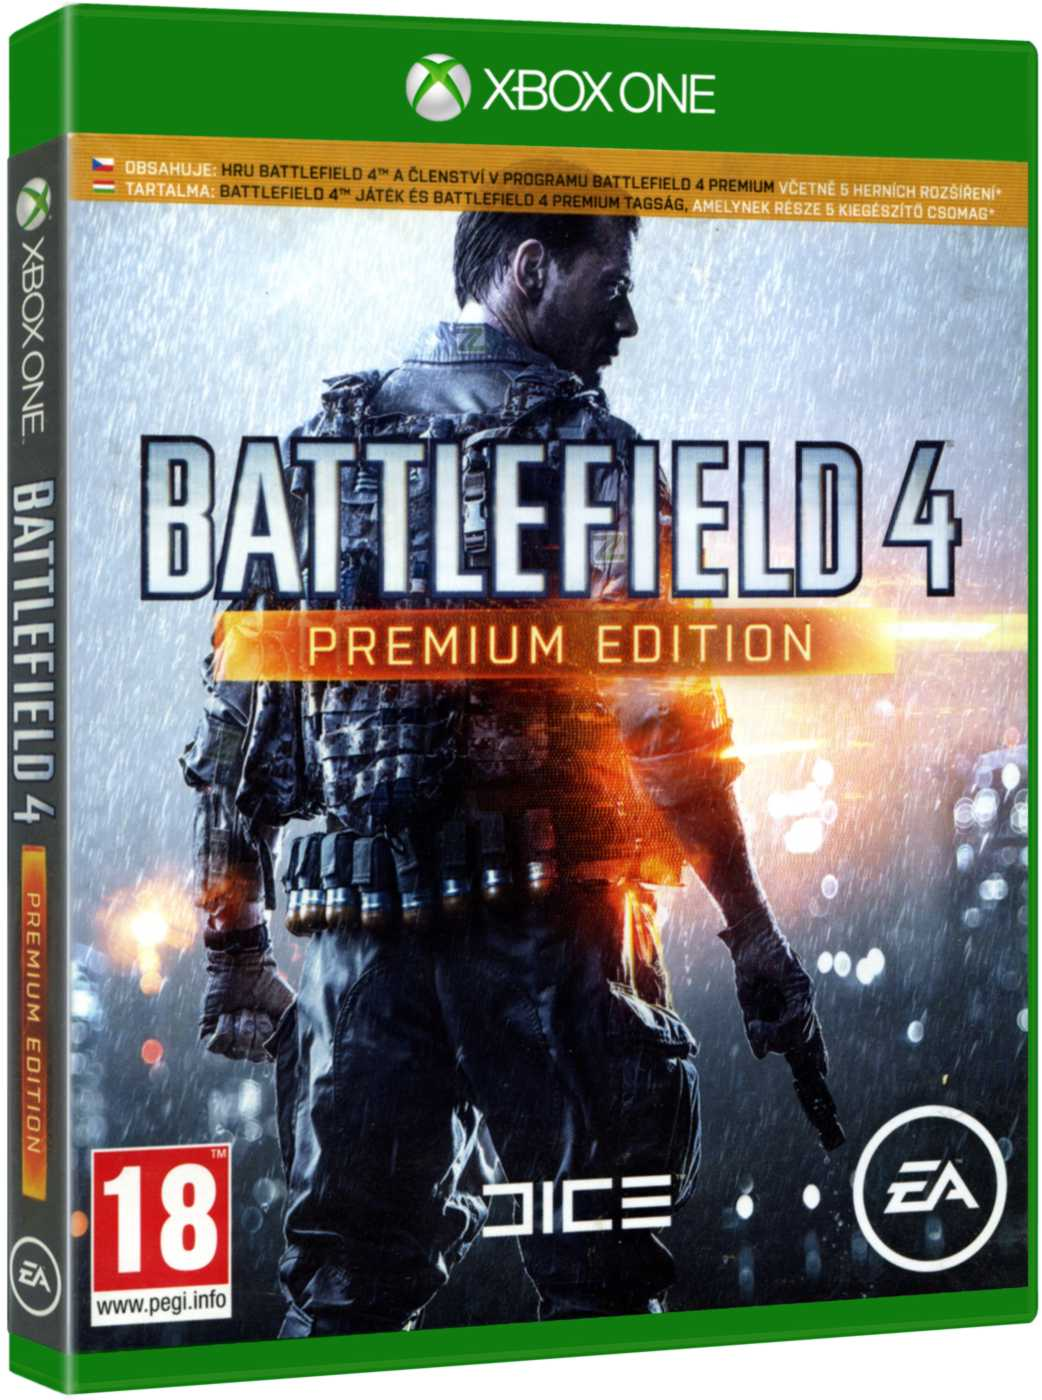 BATTLEFIELD 4 PREMIUM EDITION BUNDLE - Xbox One